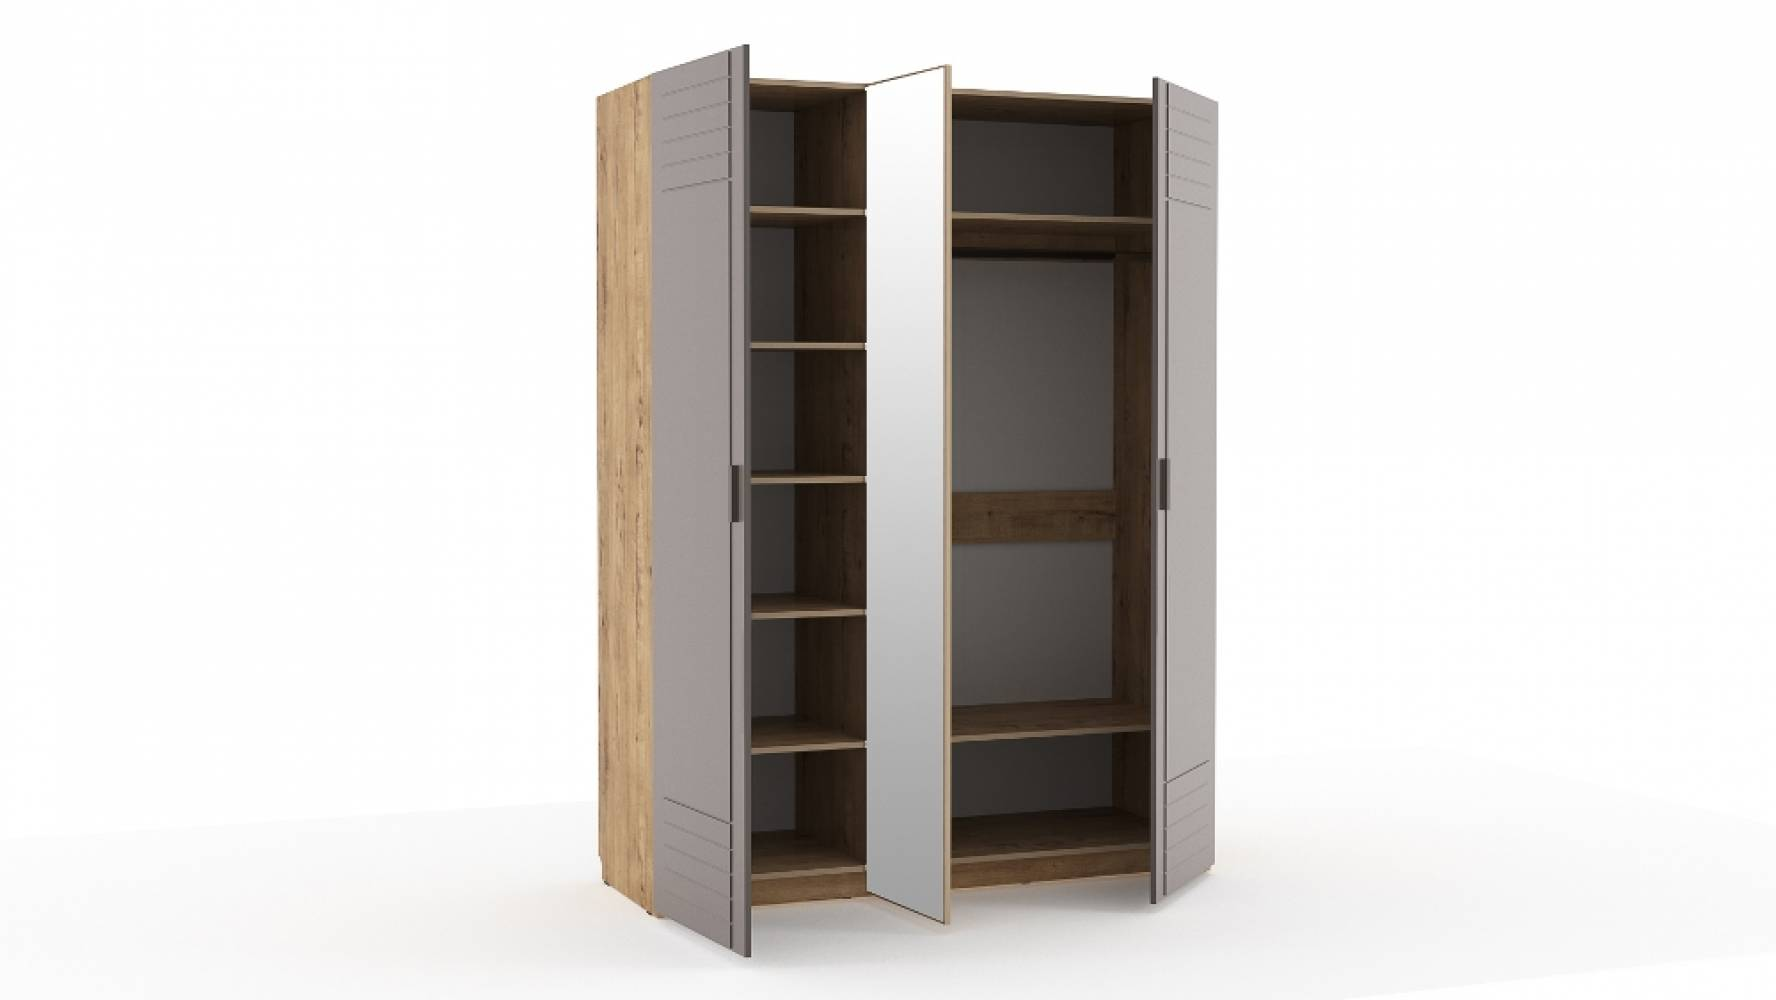 Шкаф комбинированный НМ 013.57 LIVORNO (Дуб Бунратти/Софт Графит)